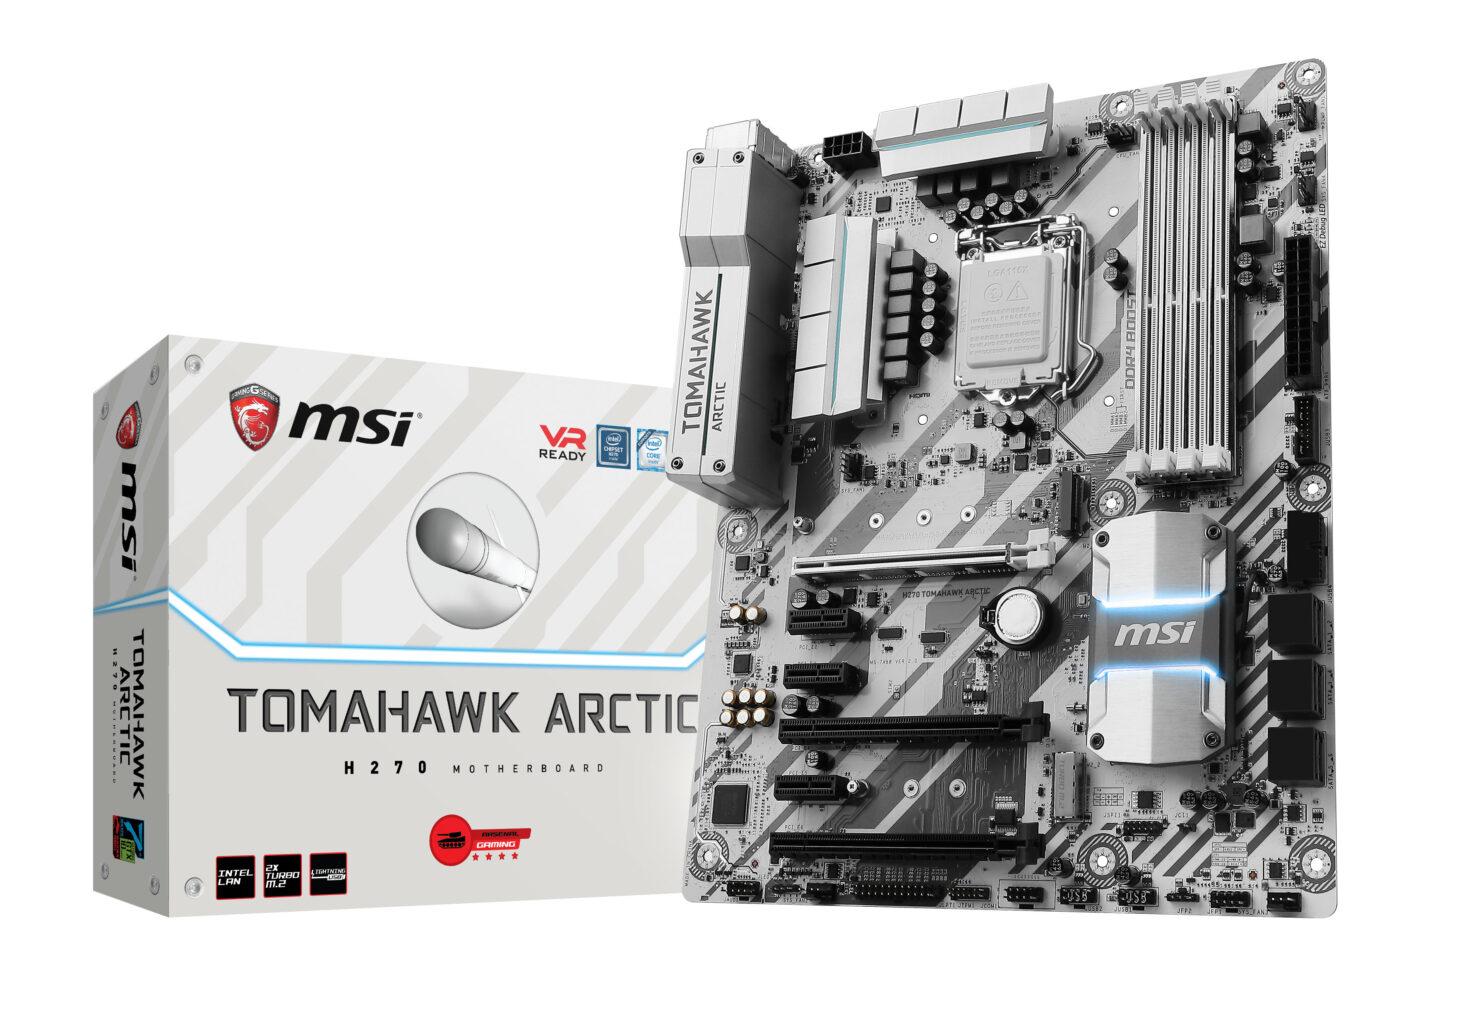 msi-h70_tomahawk_arctic-product_pictures-boxshot